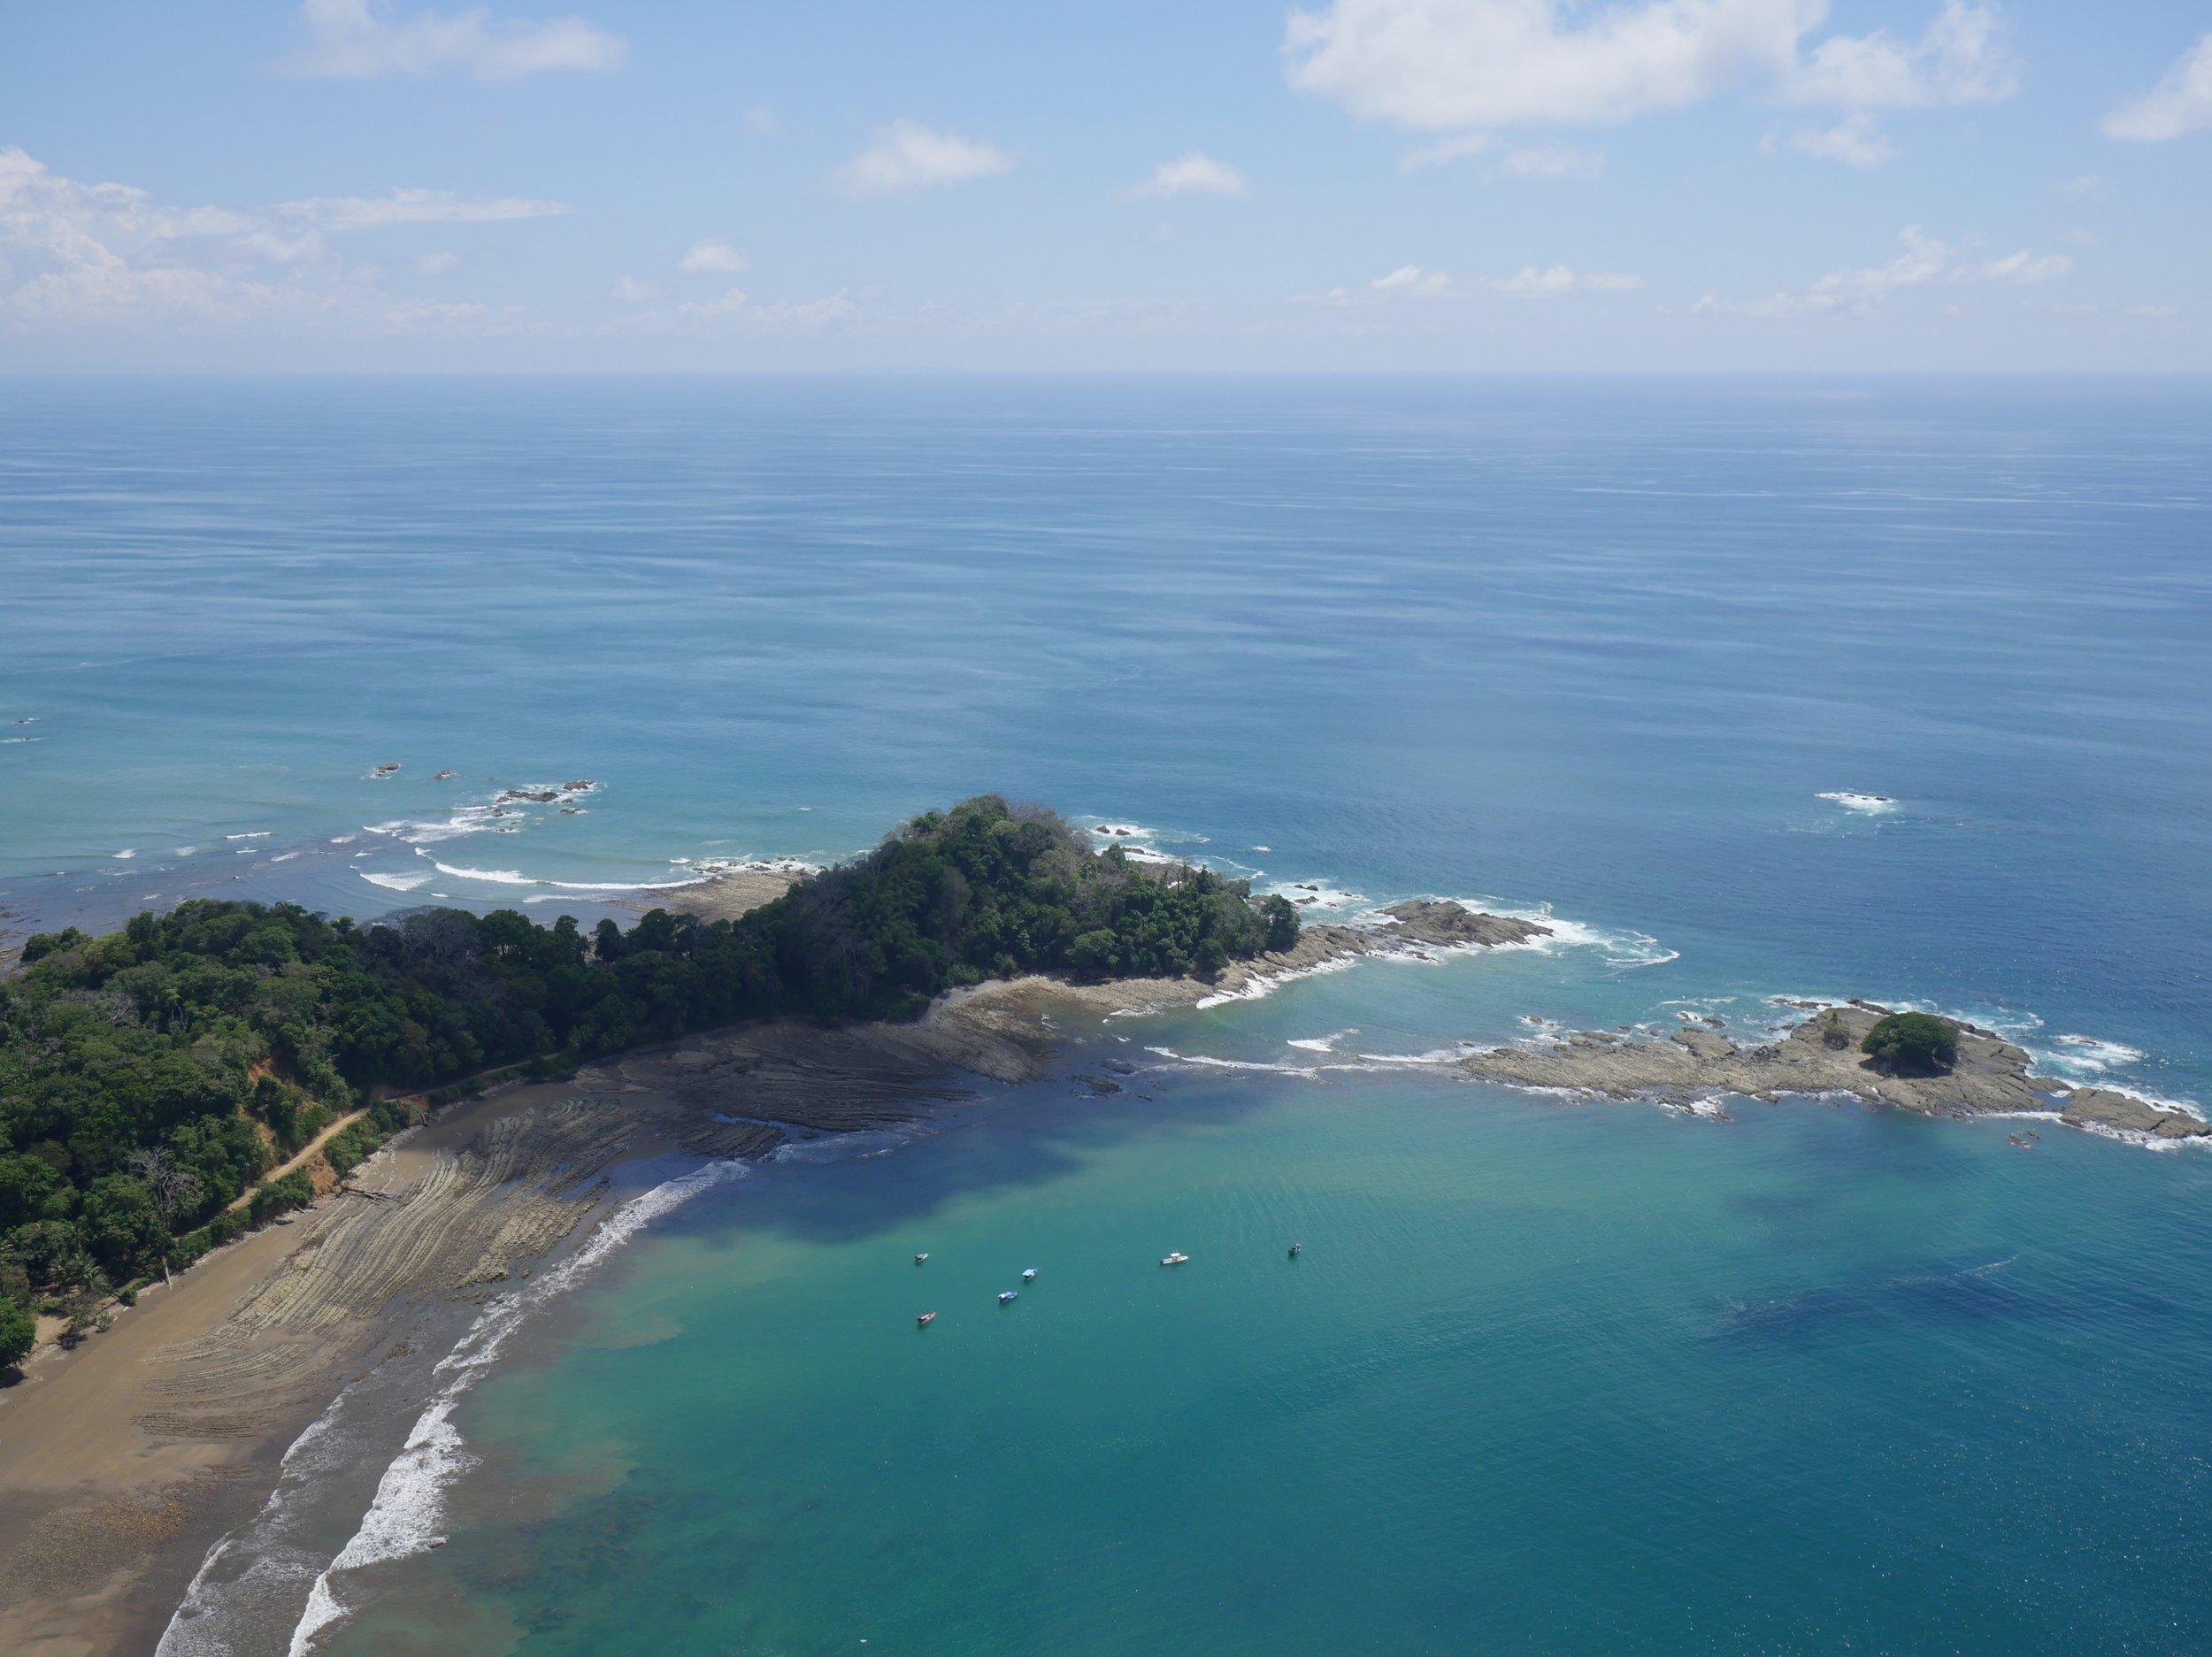 dominical-costa-rica-paragliding.jpg